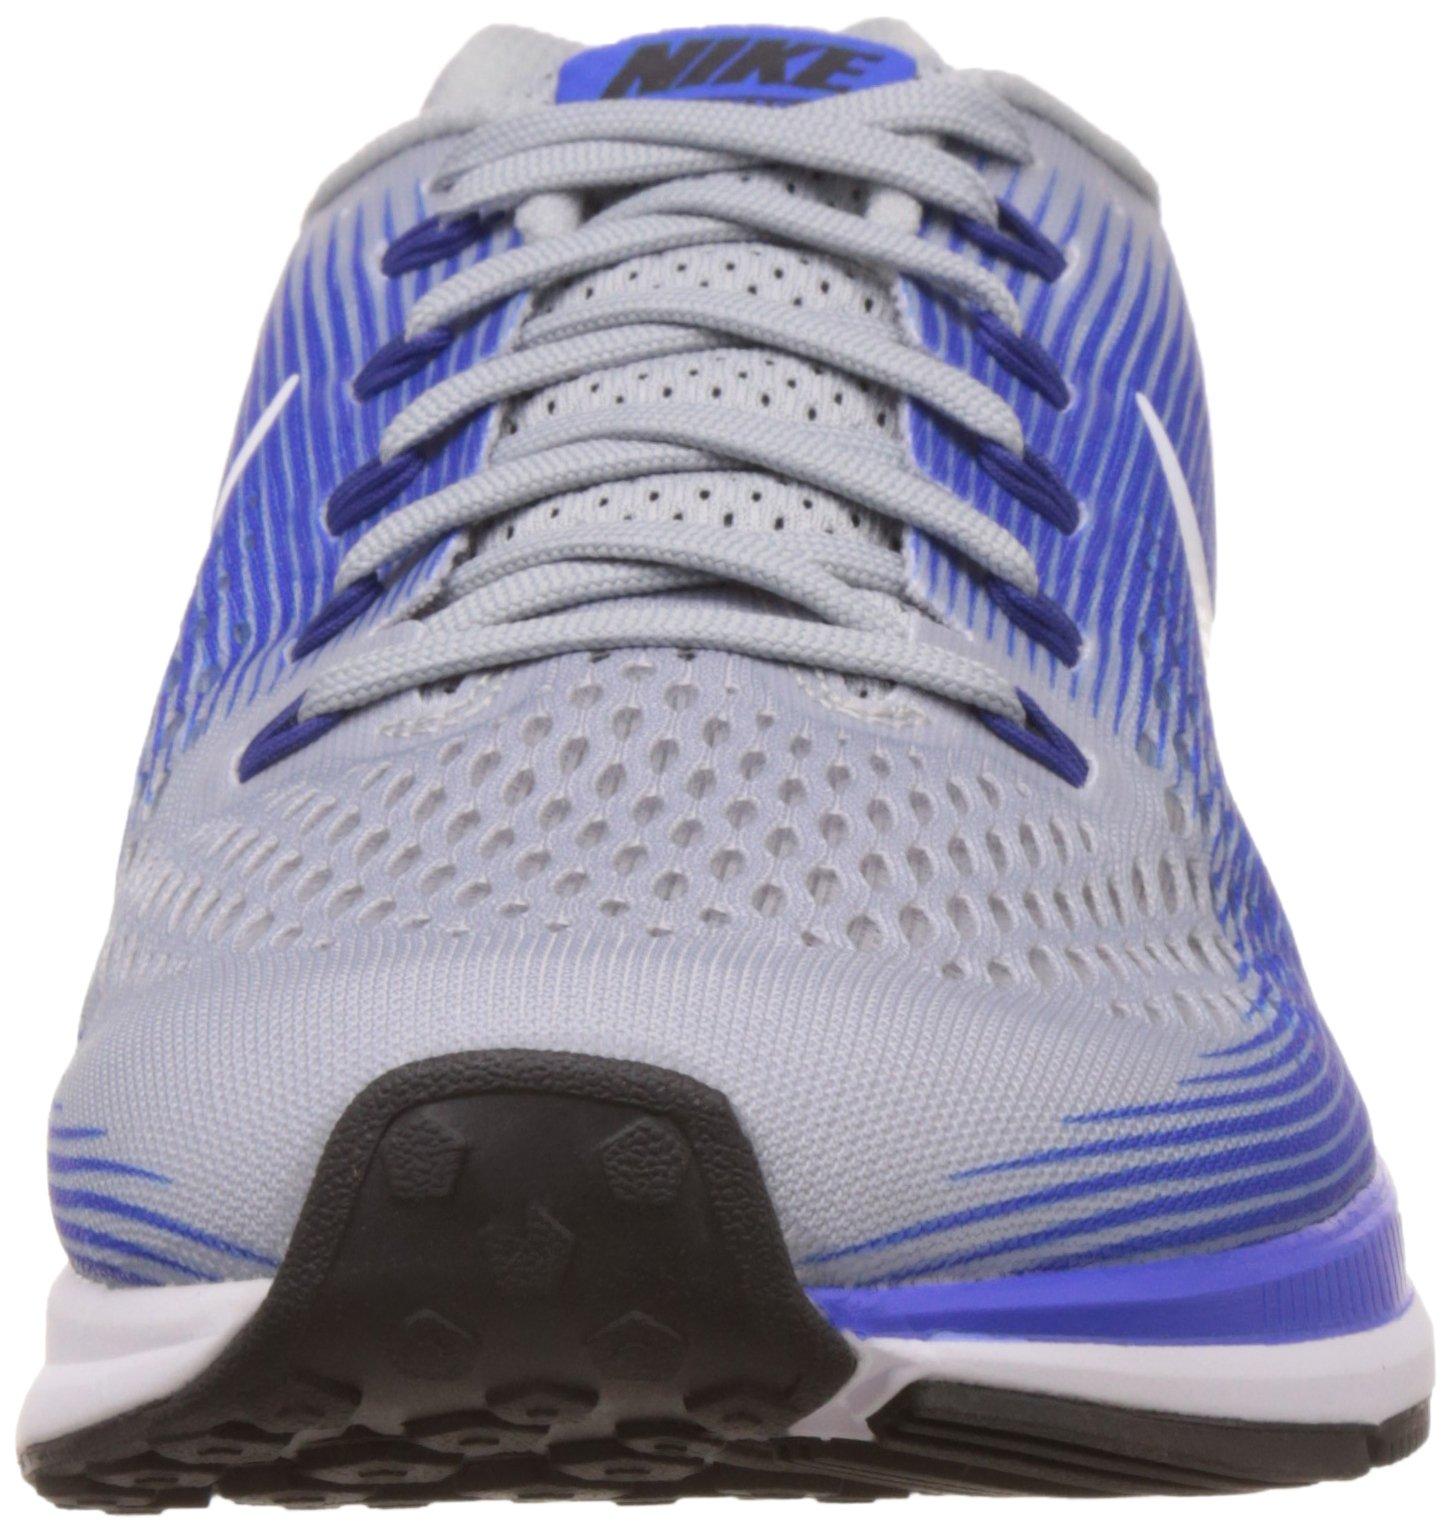 NIKE Mens Air Zoom Pegasus 34 Running Shoe (11 M US, Wolf Grey/White/Racer Blue) by Nike (Image #4)